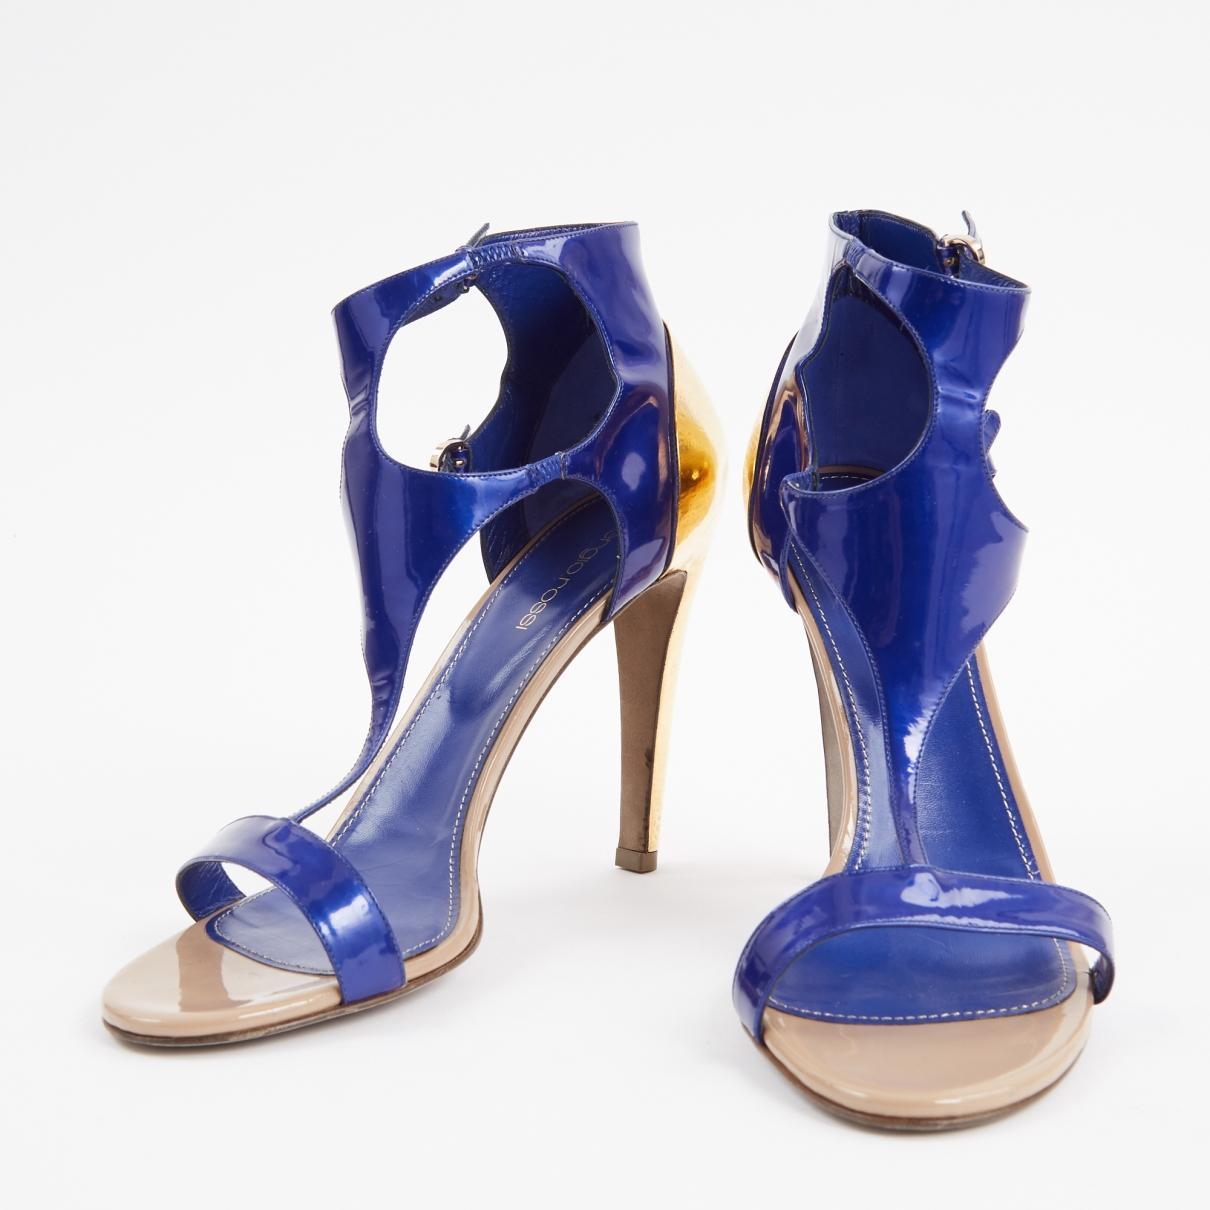 Sandales en cuir verni Sergio Rossi en coloris Bleu